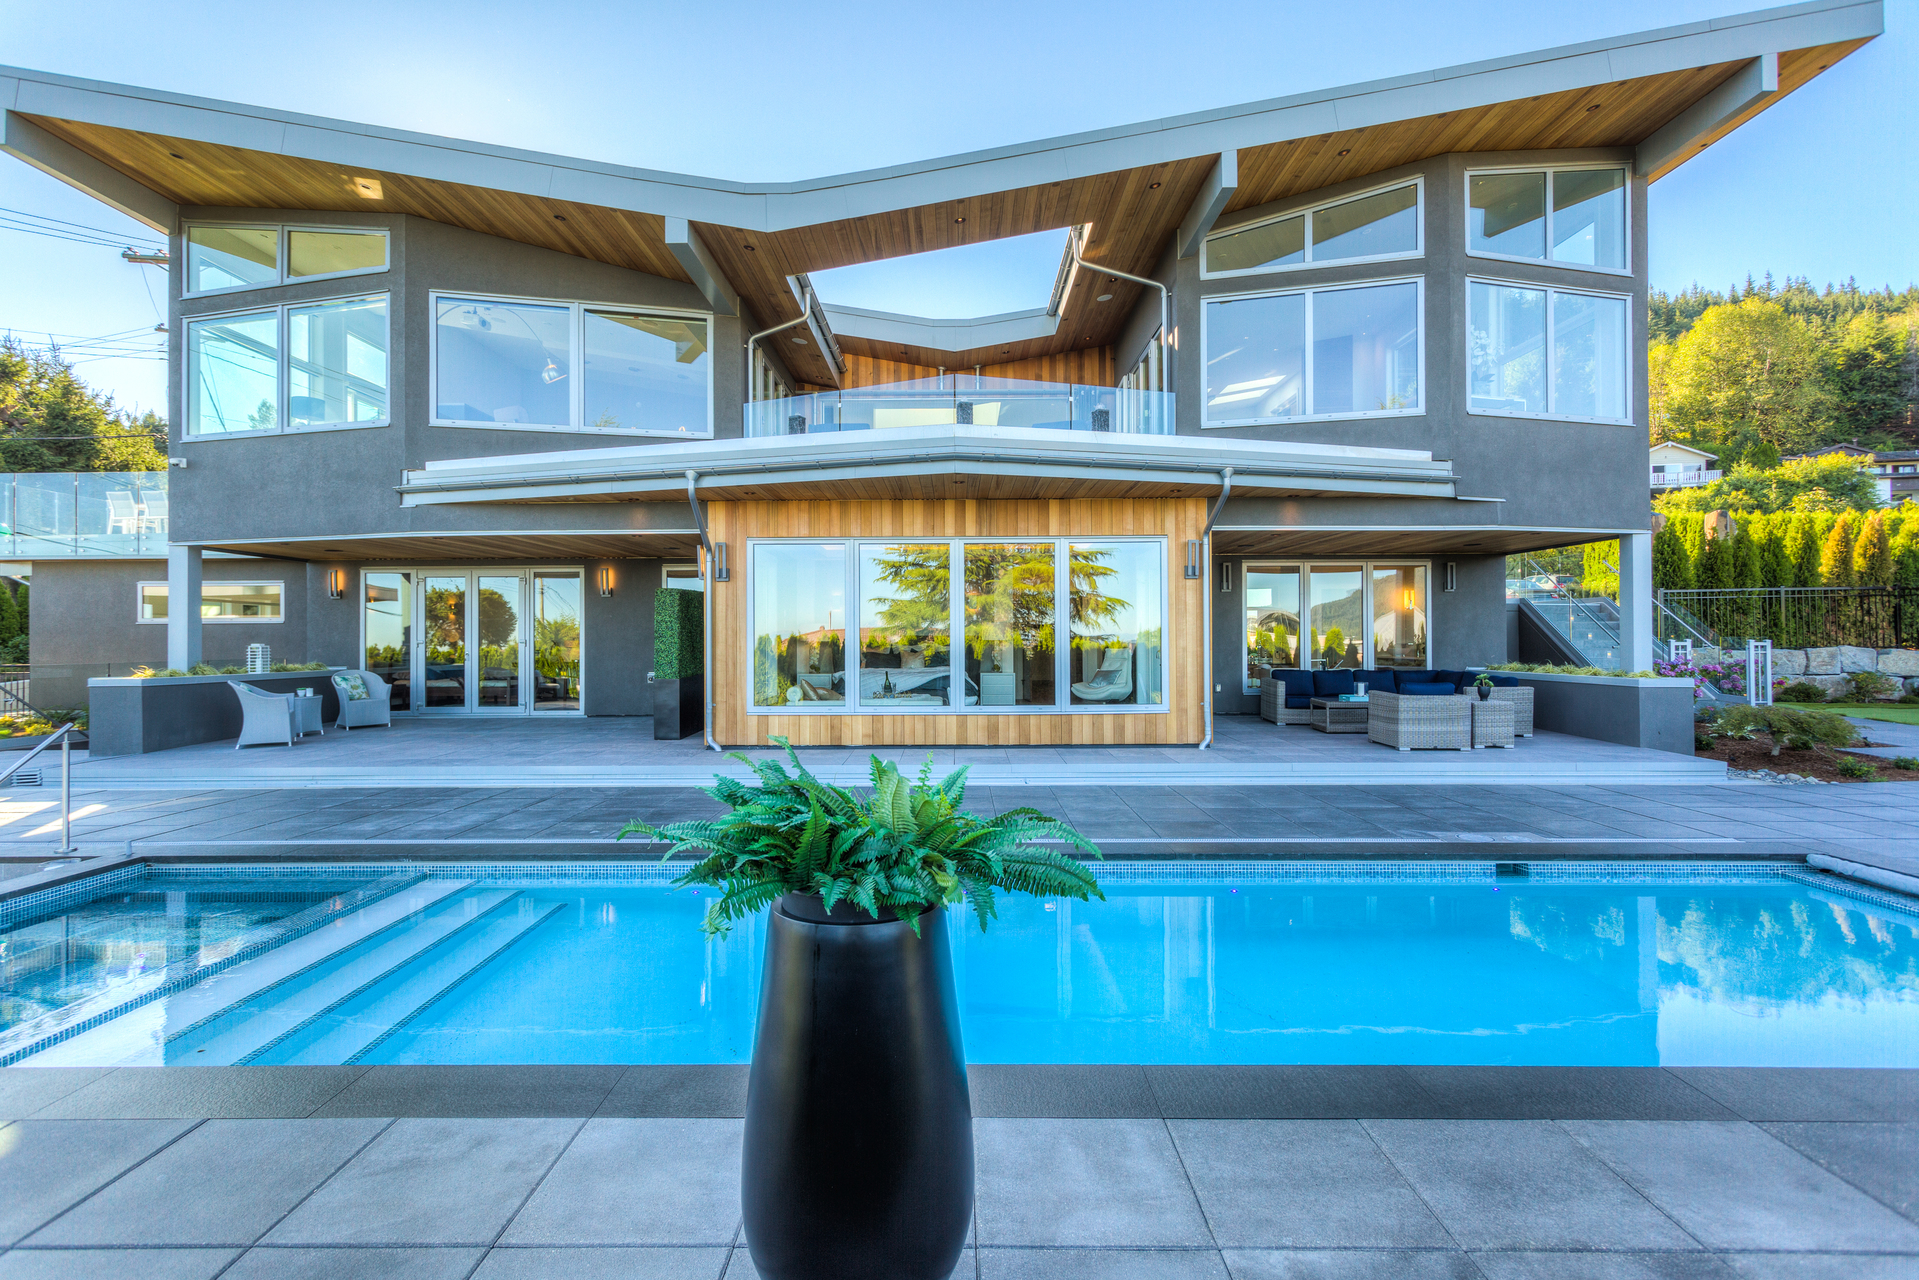 665-greenwood-rd-360hometours-81 at 665 Greenwood Road, British Properties, West Vancouver